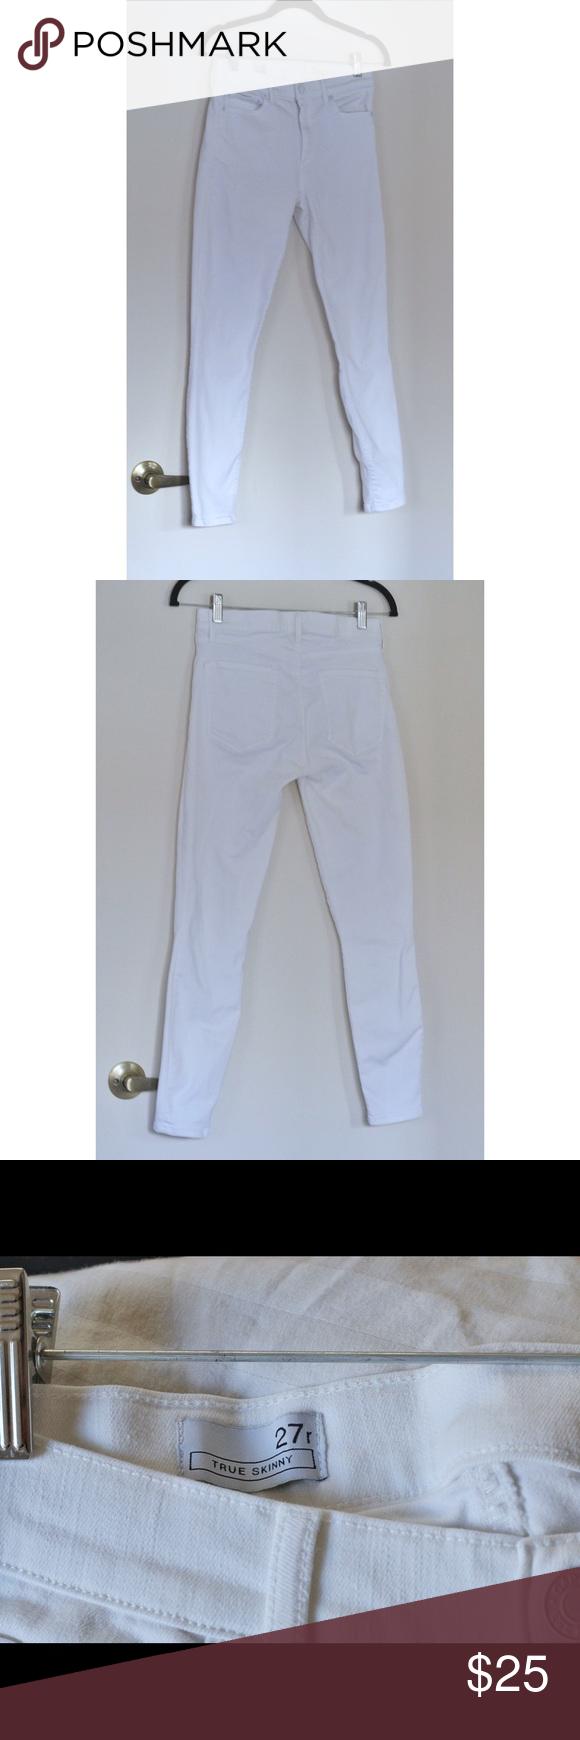 Women's Gap True Skinny White Jeans Brand: Gap True Skinny Size: 27R GAP Jeans Skinny